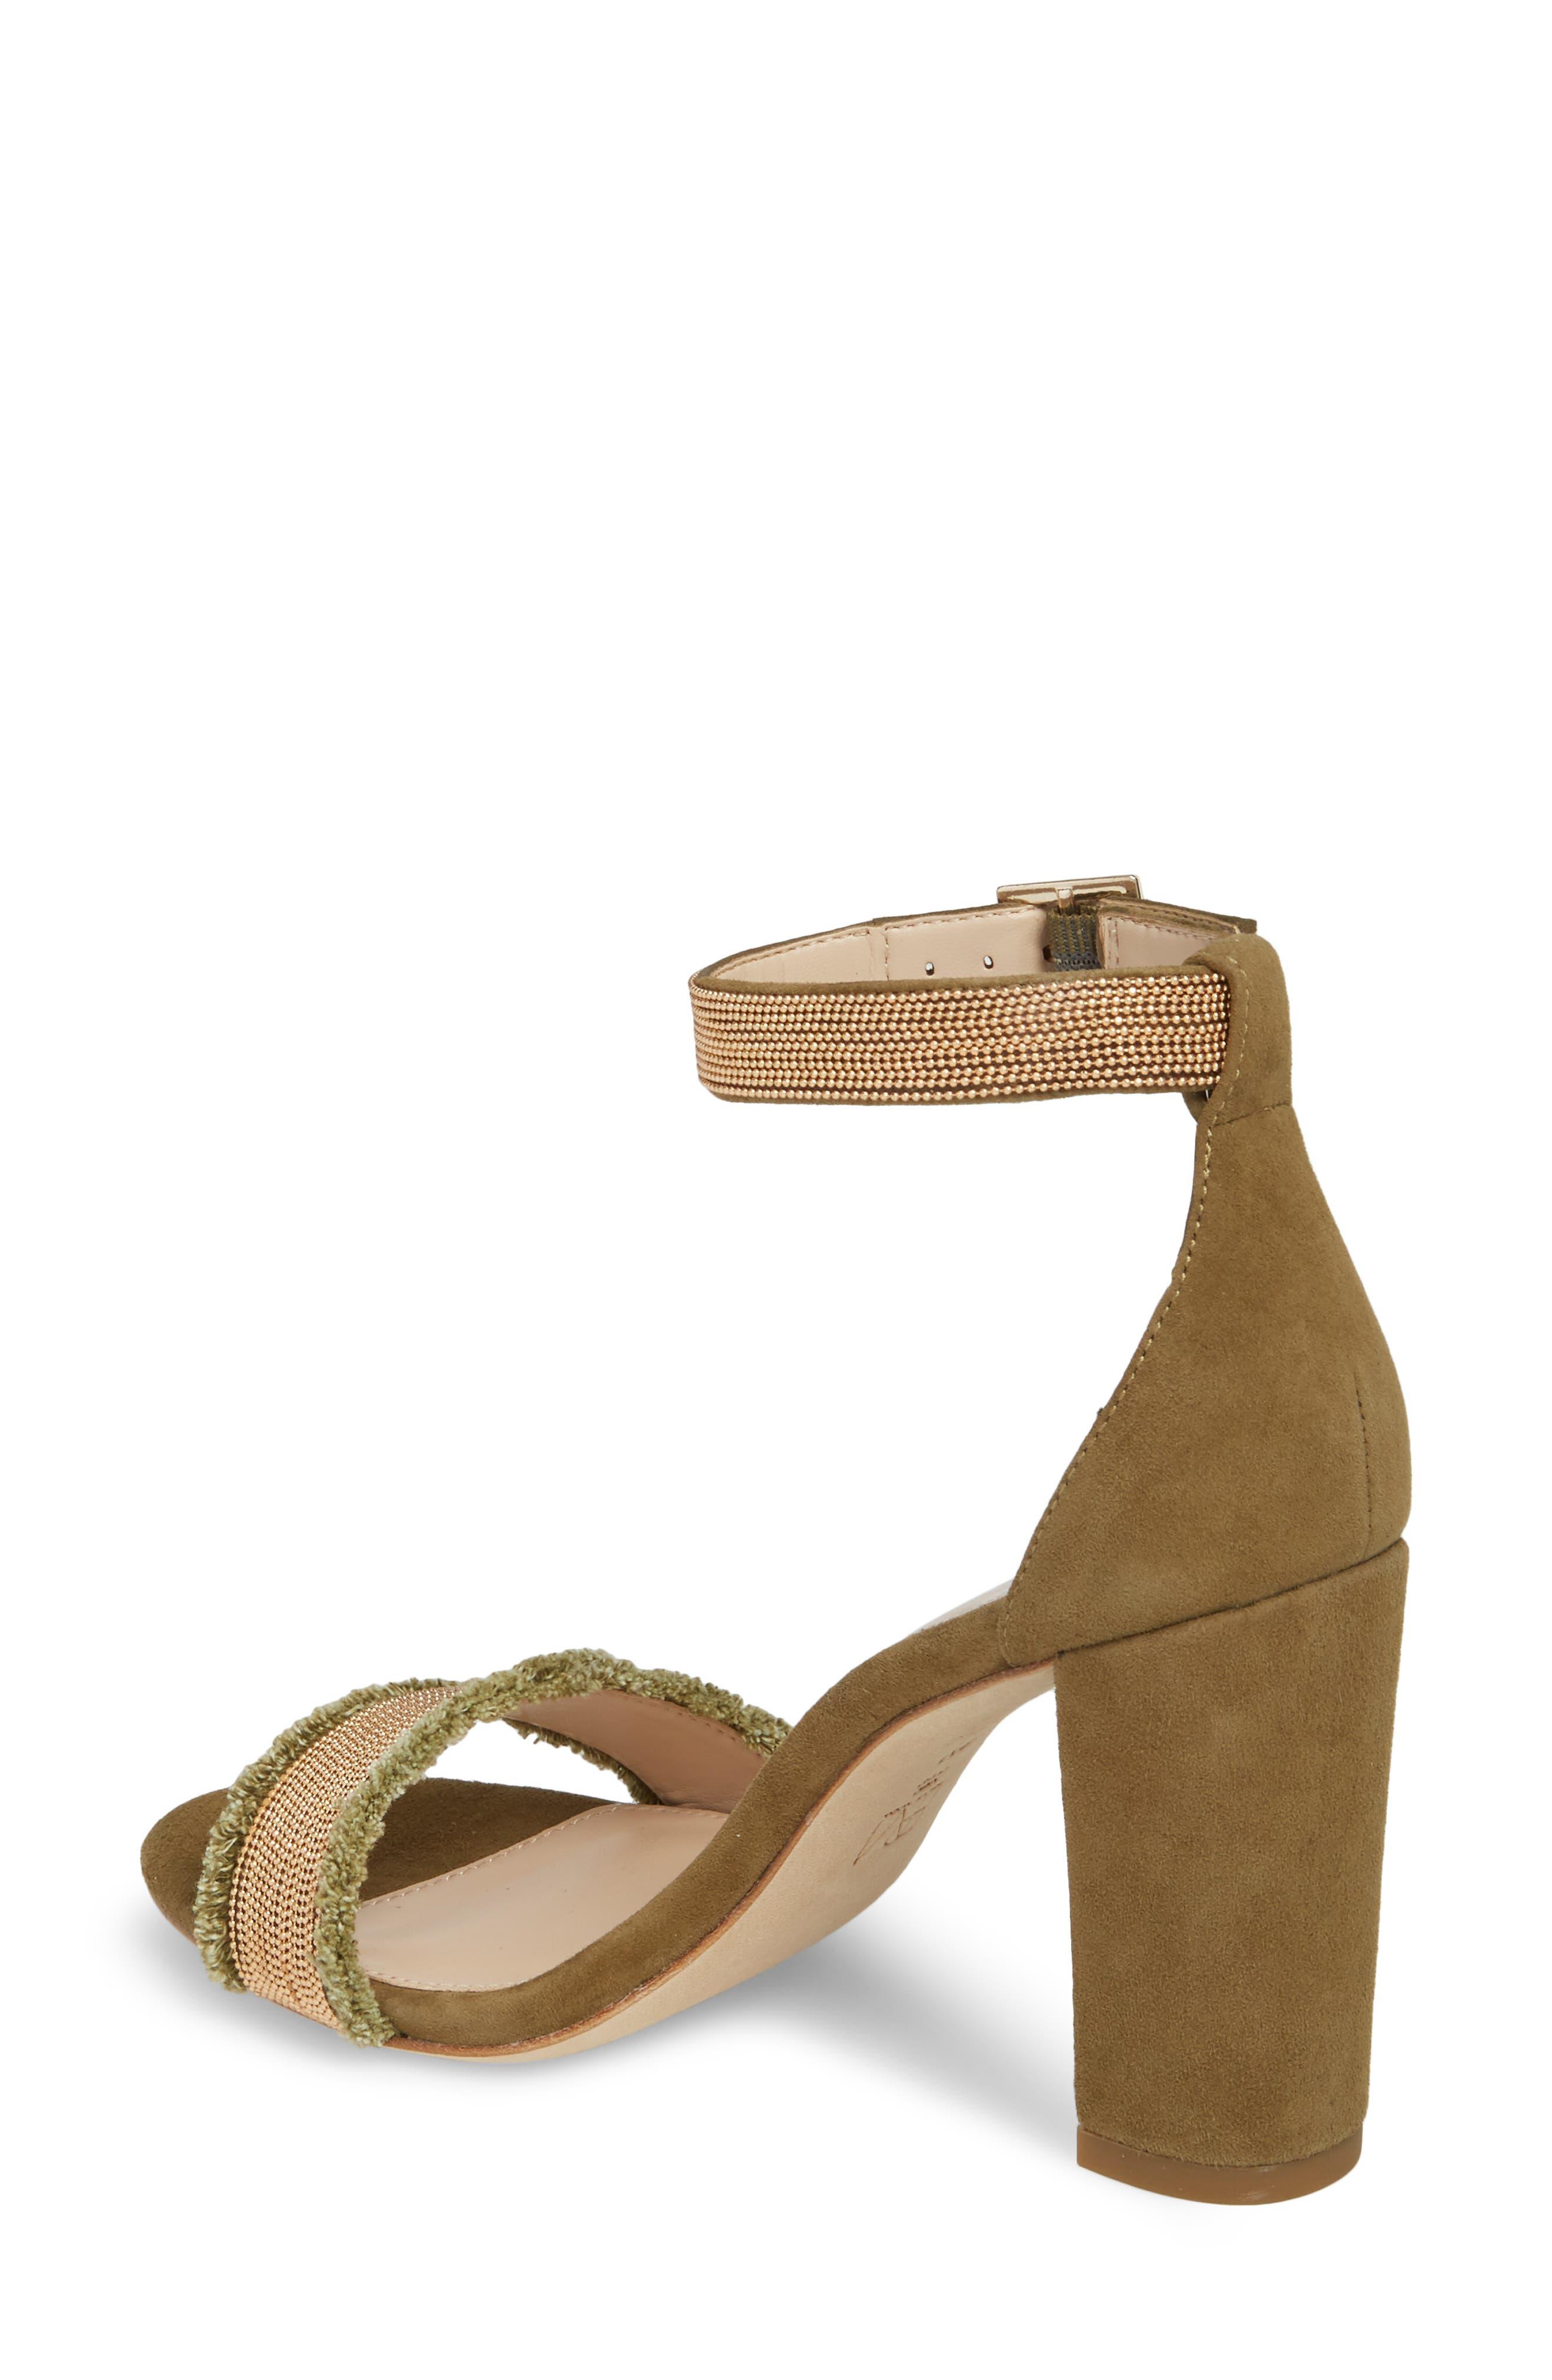 Bonnie6 Embellished Sandal,                             Alternate thumbnail 2, color,                             KHAKI SUEDE